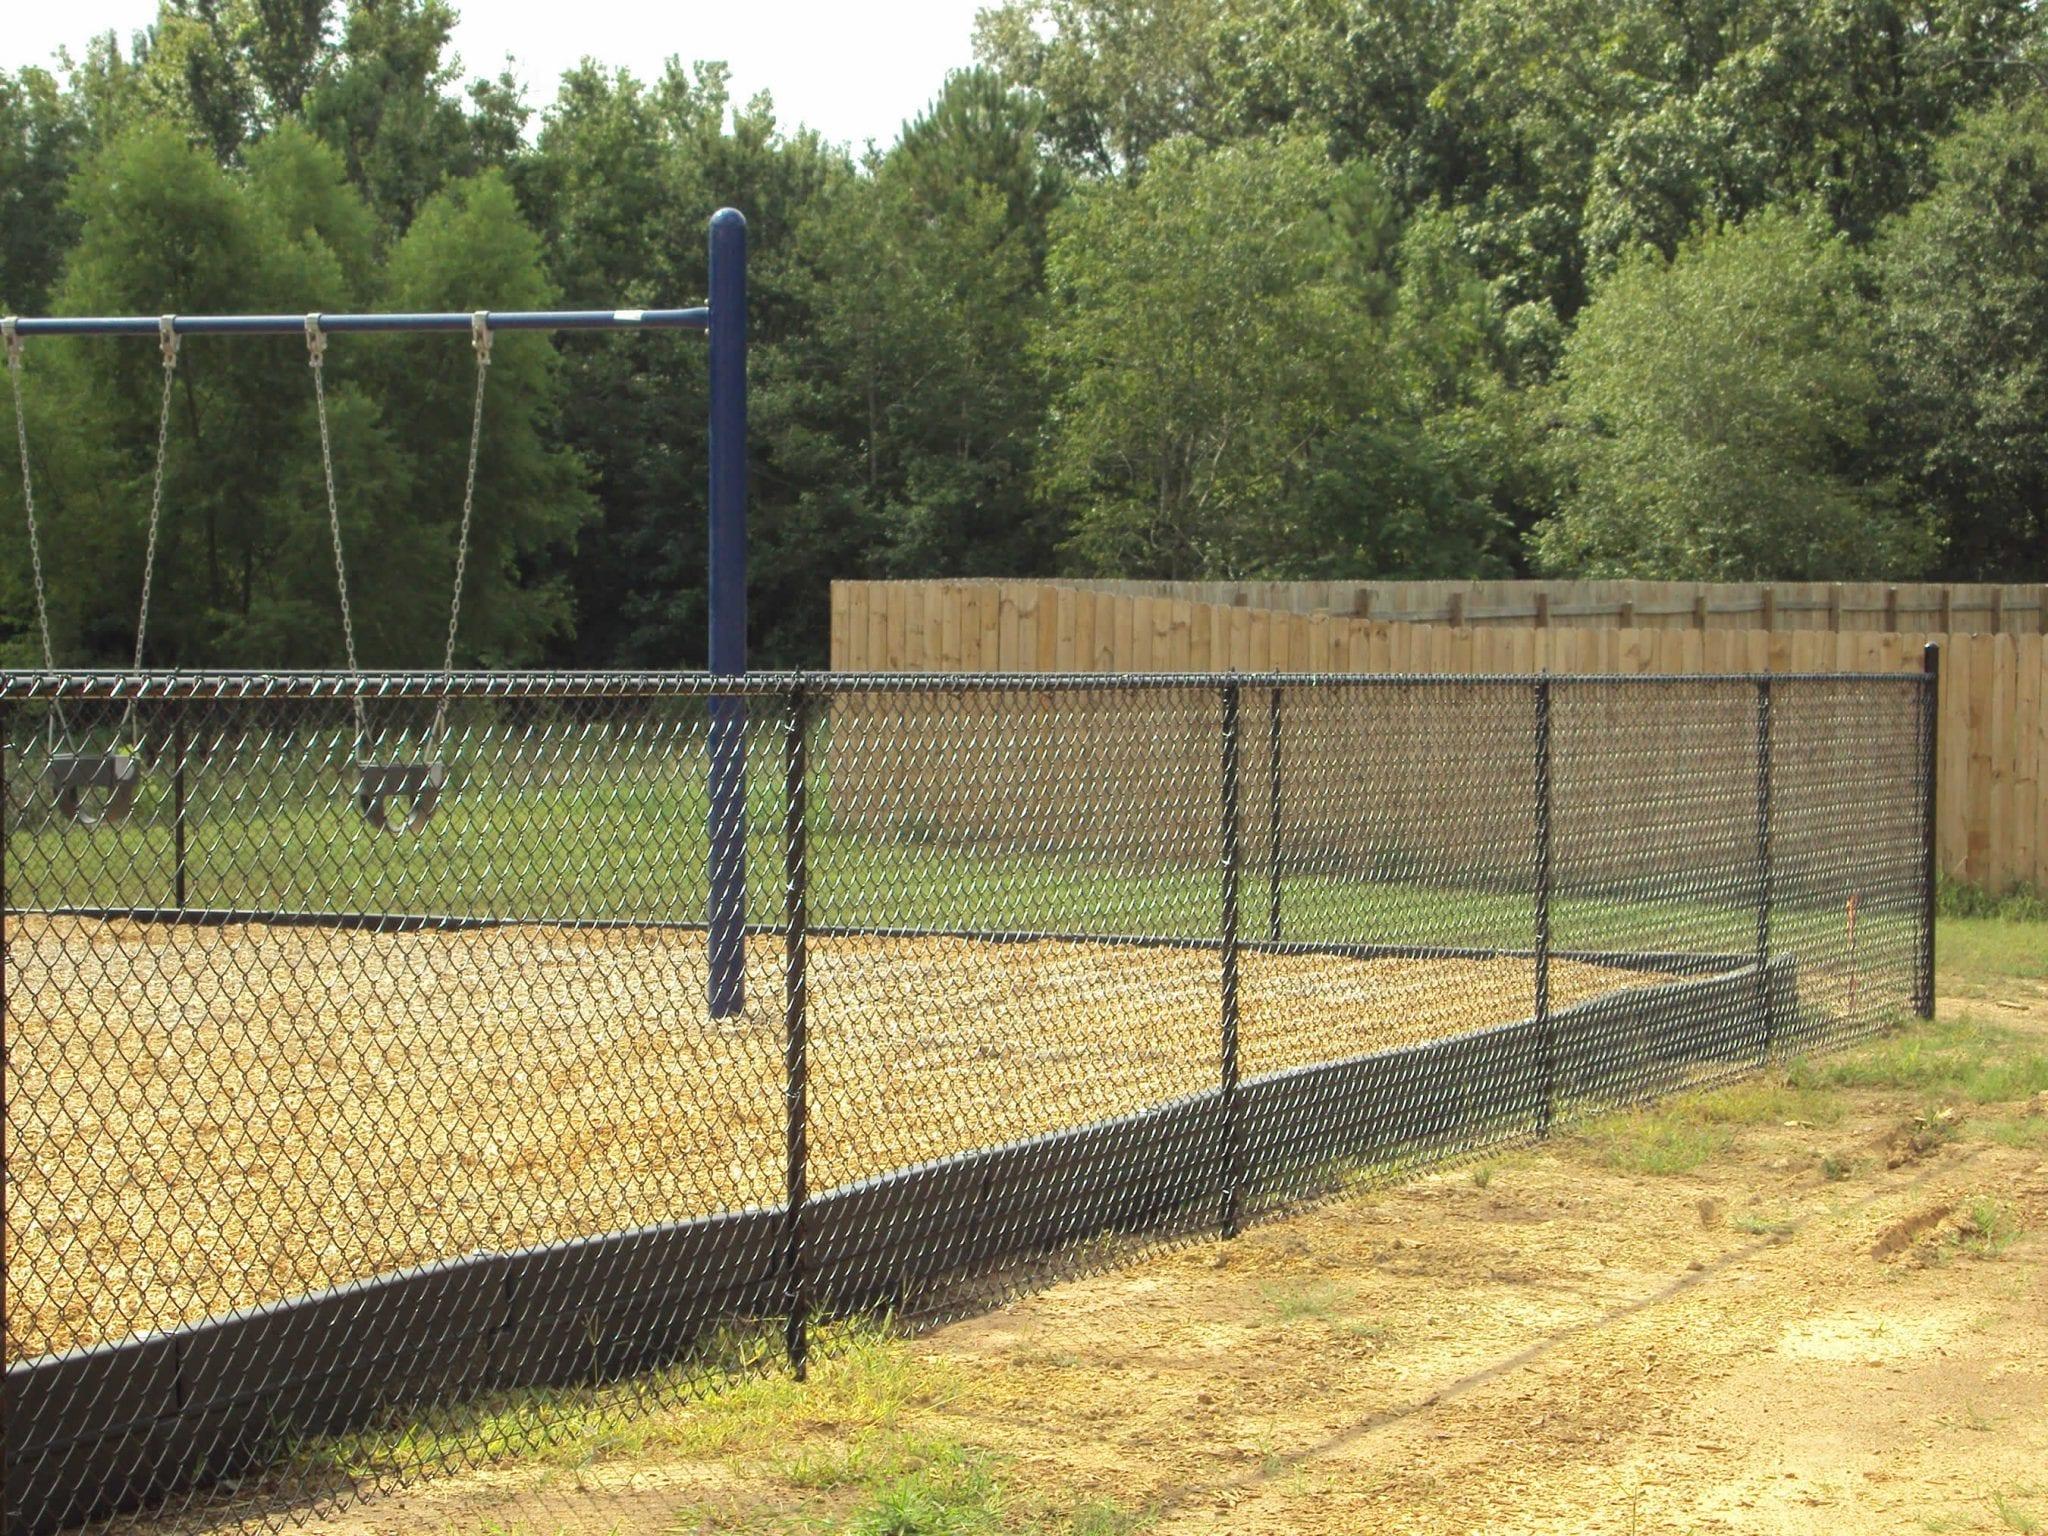 Commercial chain link fencing birmingham al fence services